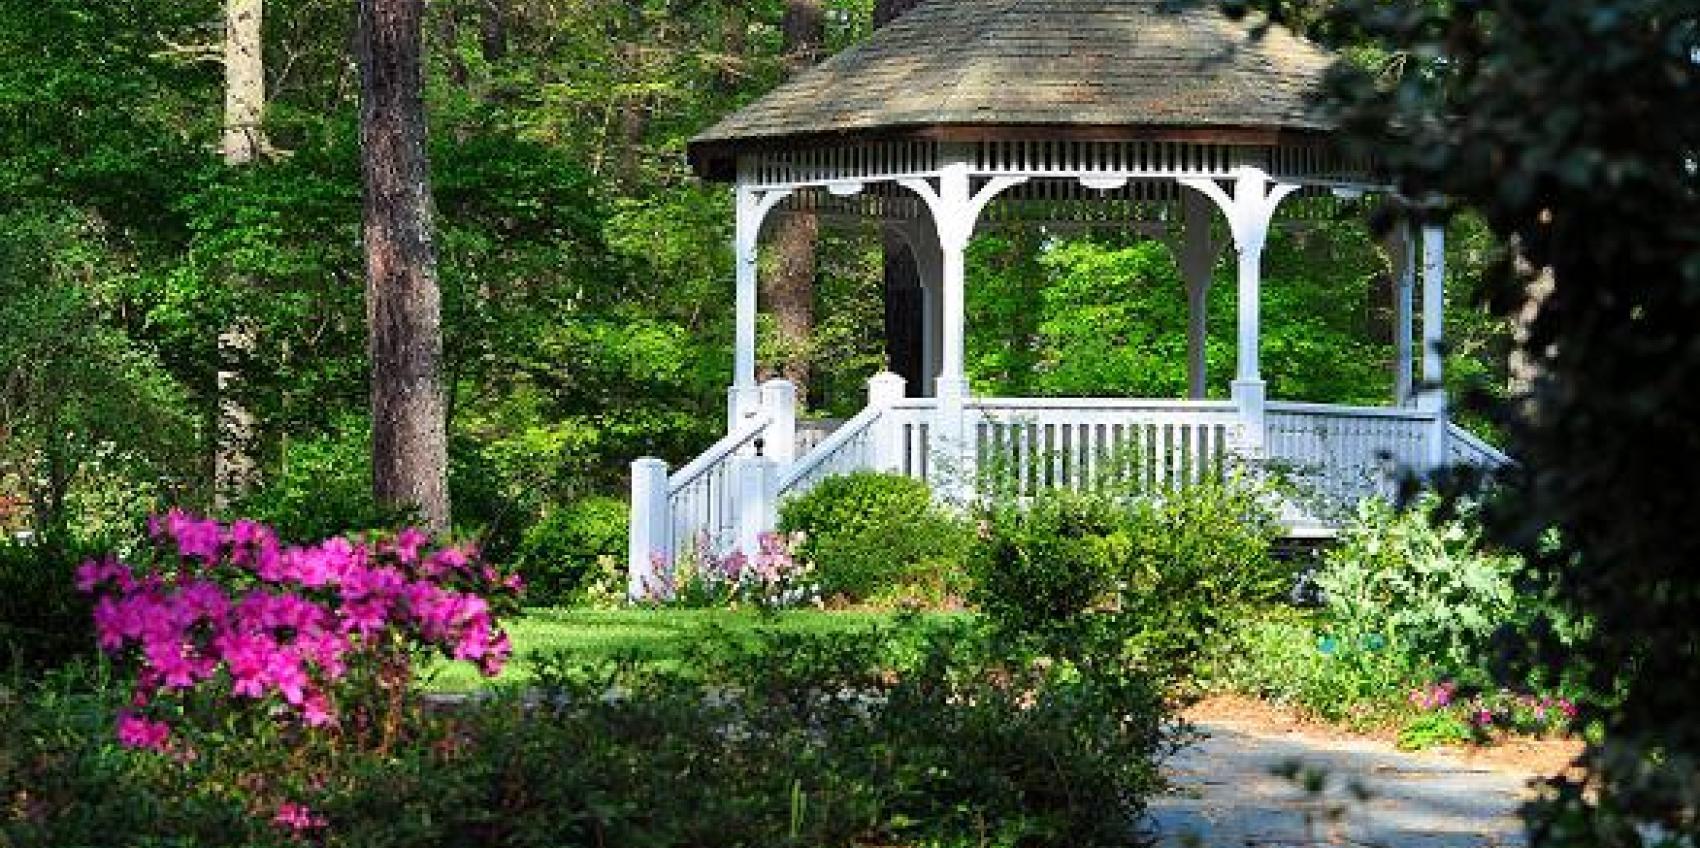 Cape Fear Botanical Garden American Public Gardens Association